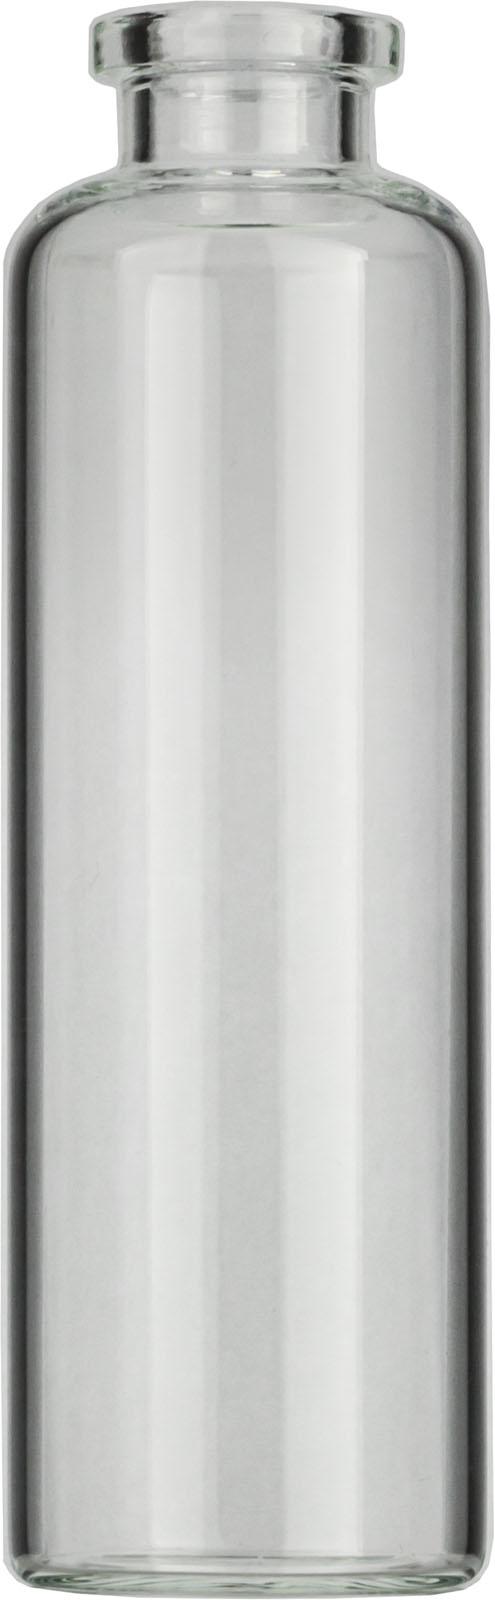 Vial N20-50, RR, k, 31x101, fl., DIN